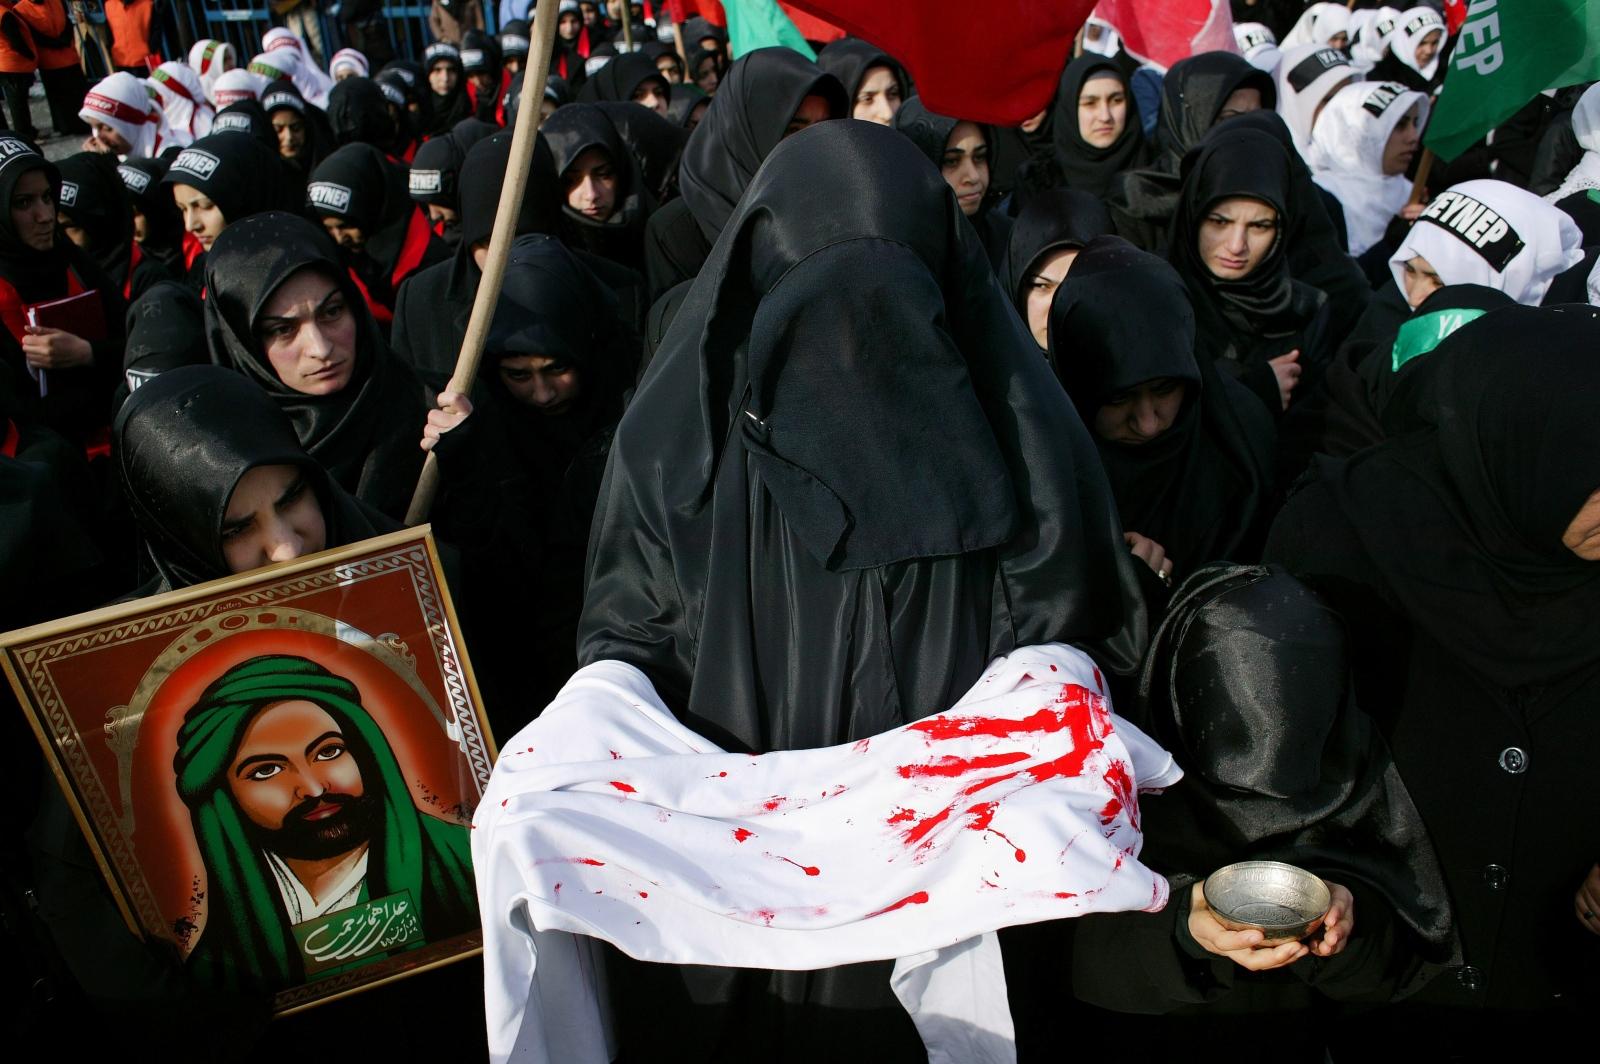 Shia Muslims gather for Ashura in the Zeytinburnu district of Istanbul.